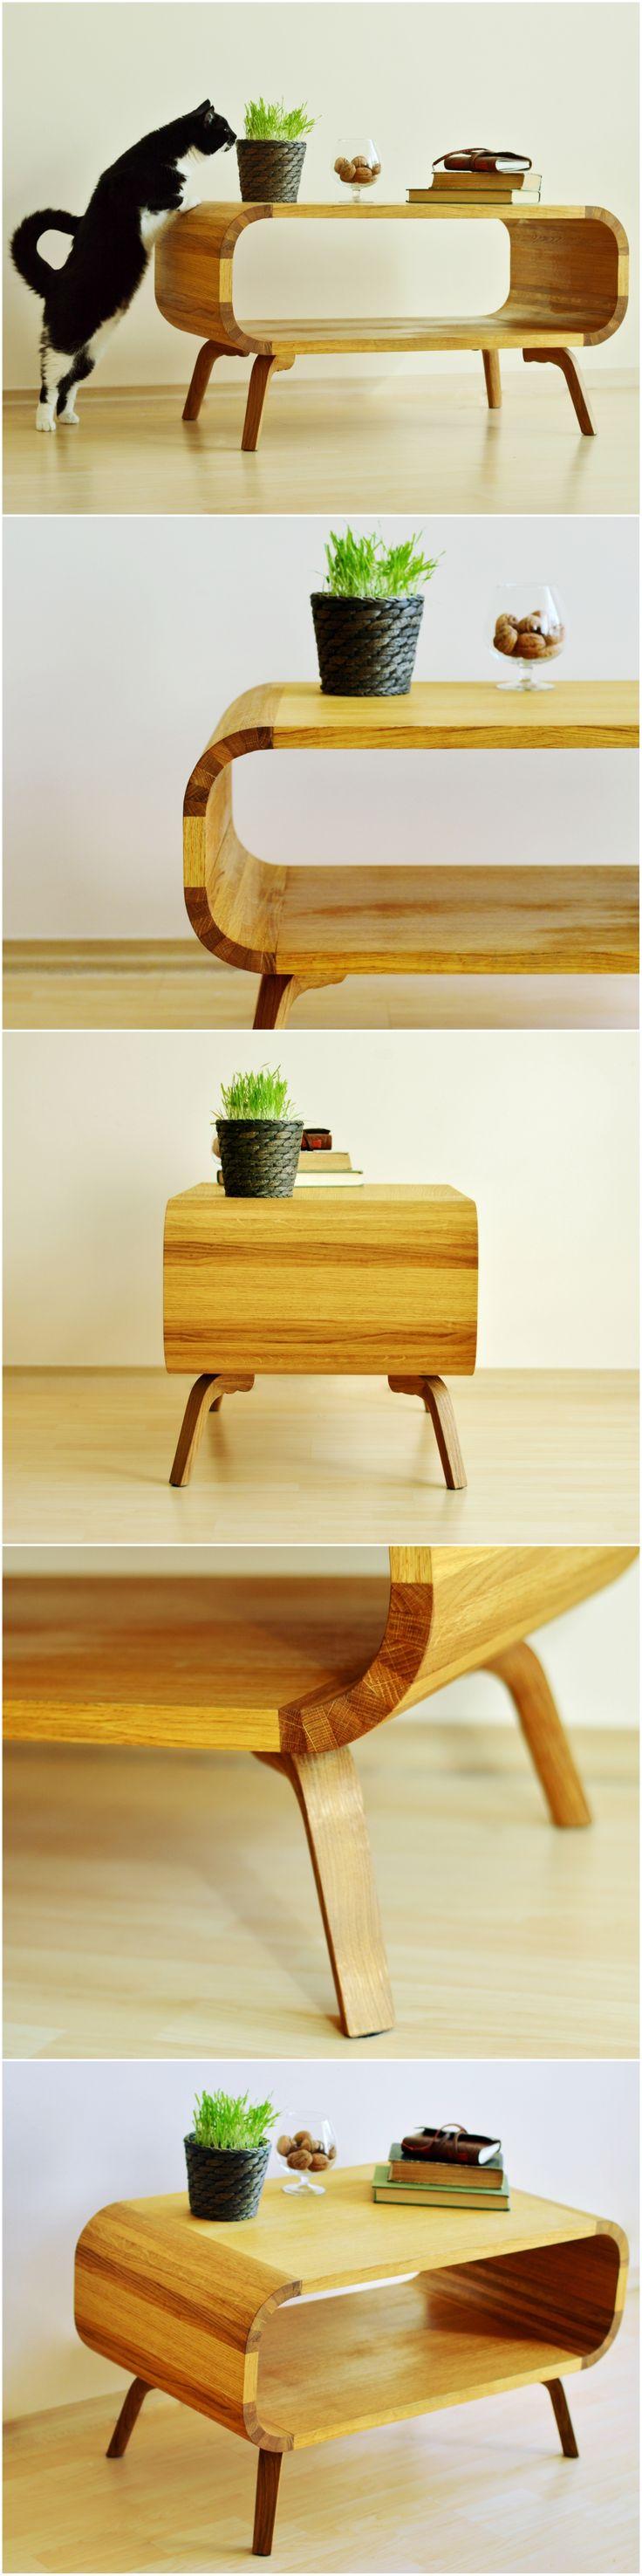 Coffee Table Side End Table Custom Mid Century Modern Handmade Living Room Solid Oak Board Wood Painted Furniture Retro Scandinavian Cafe